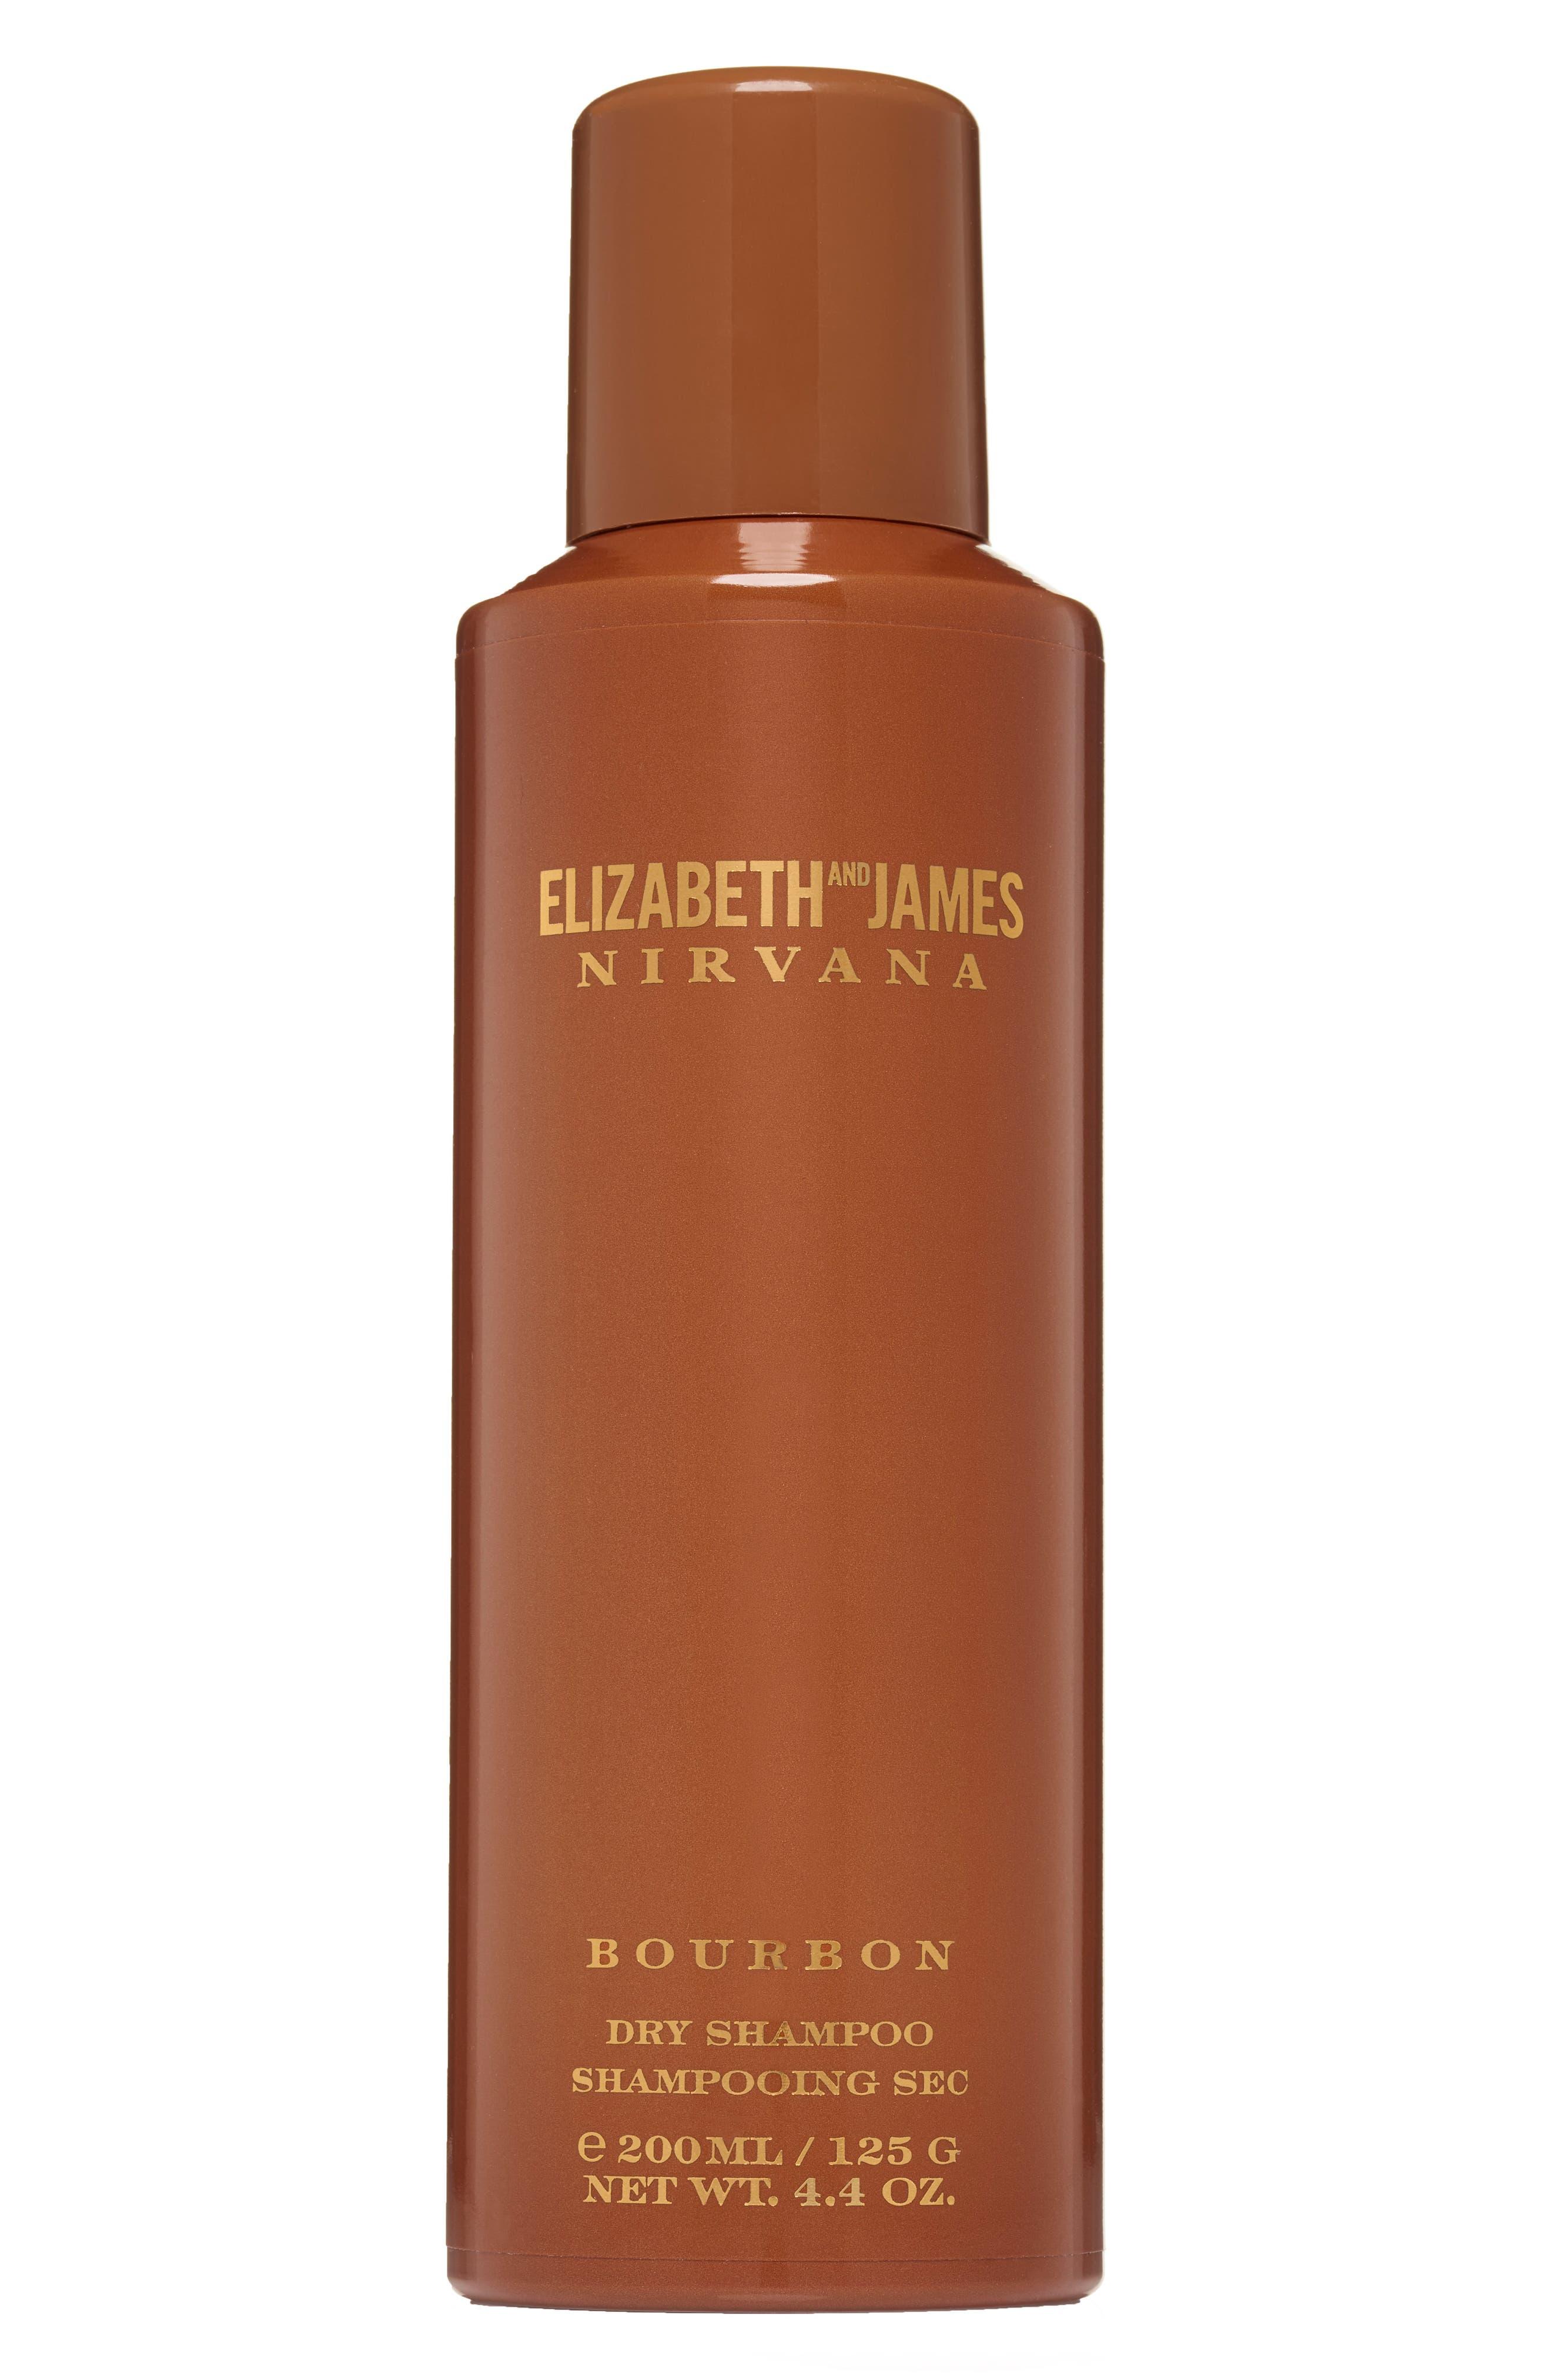 Alternate Image 1 Selected - Elizabeth and James Nirvana Bourbon Dry Shampoo